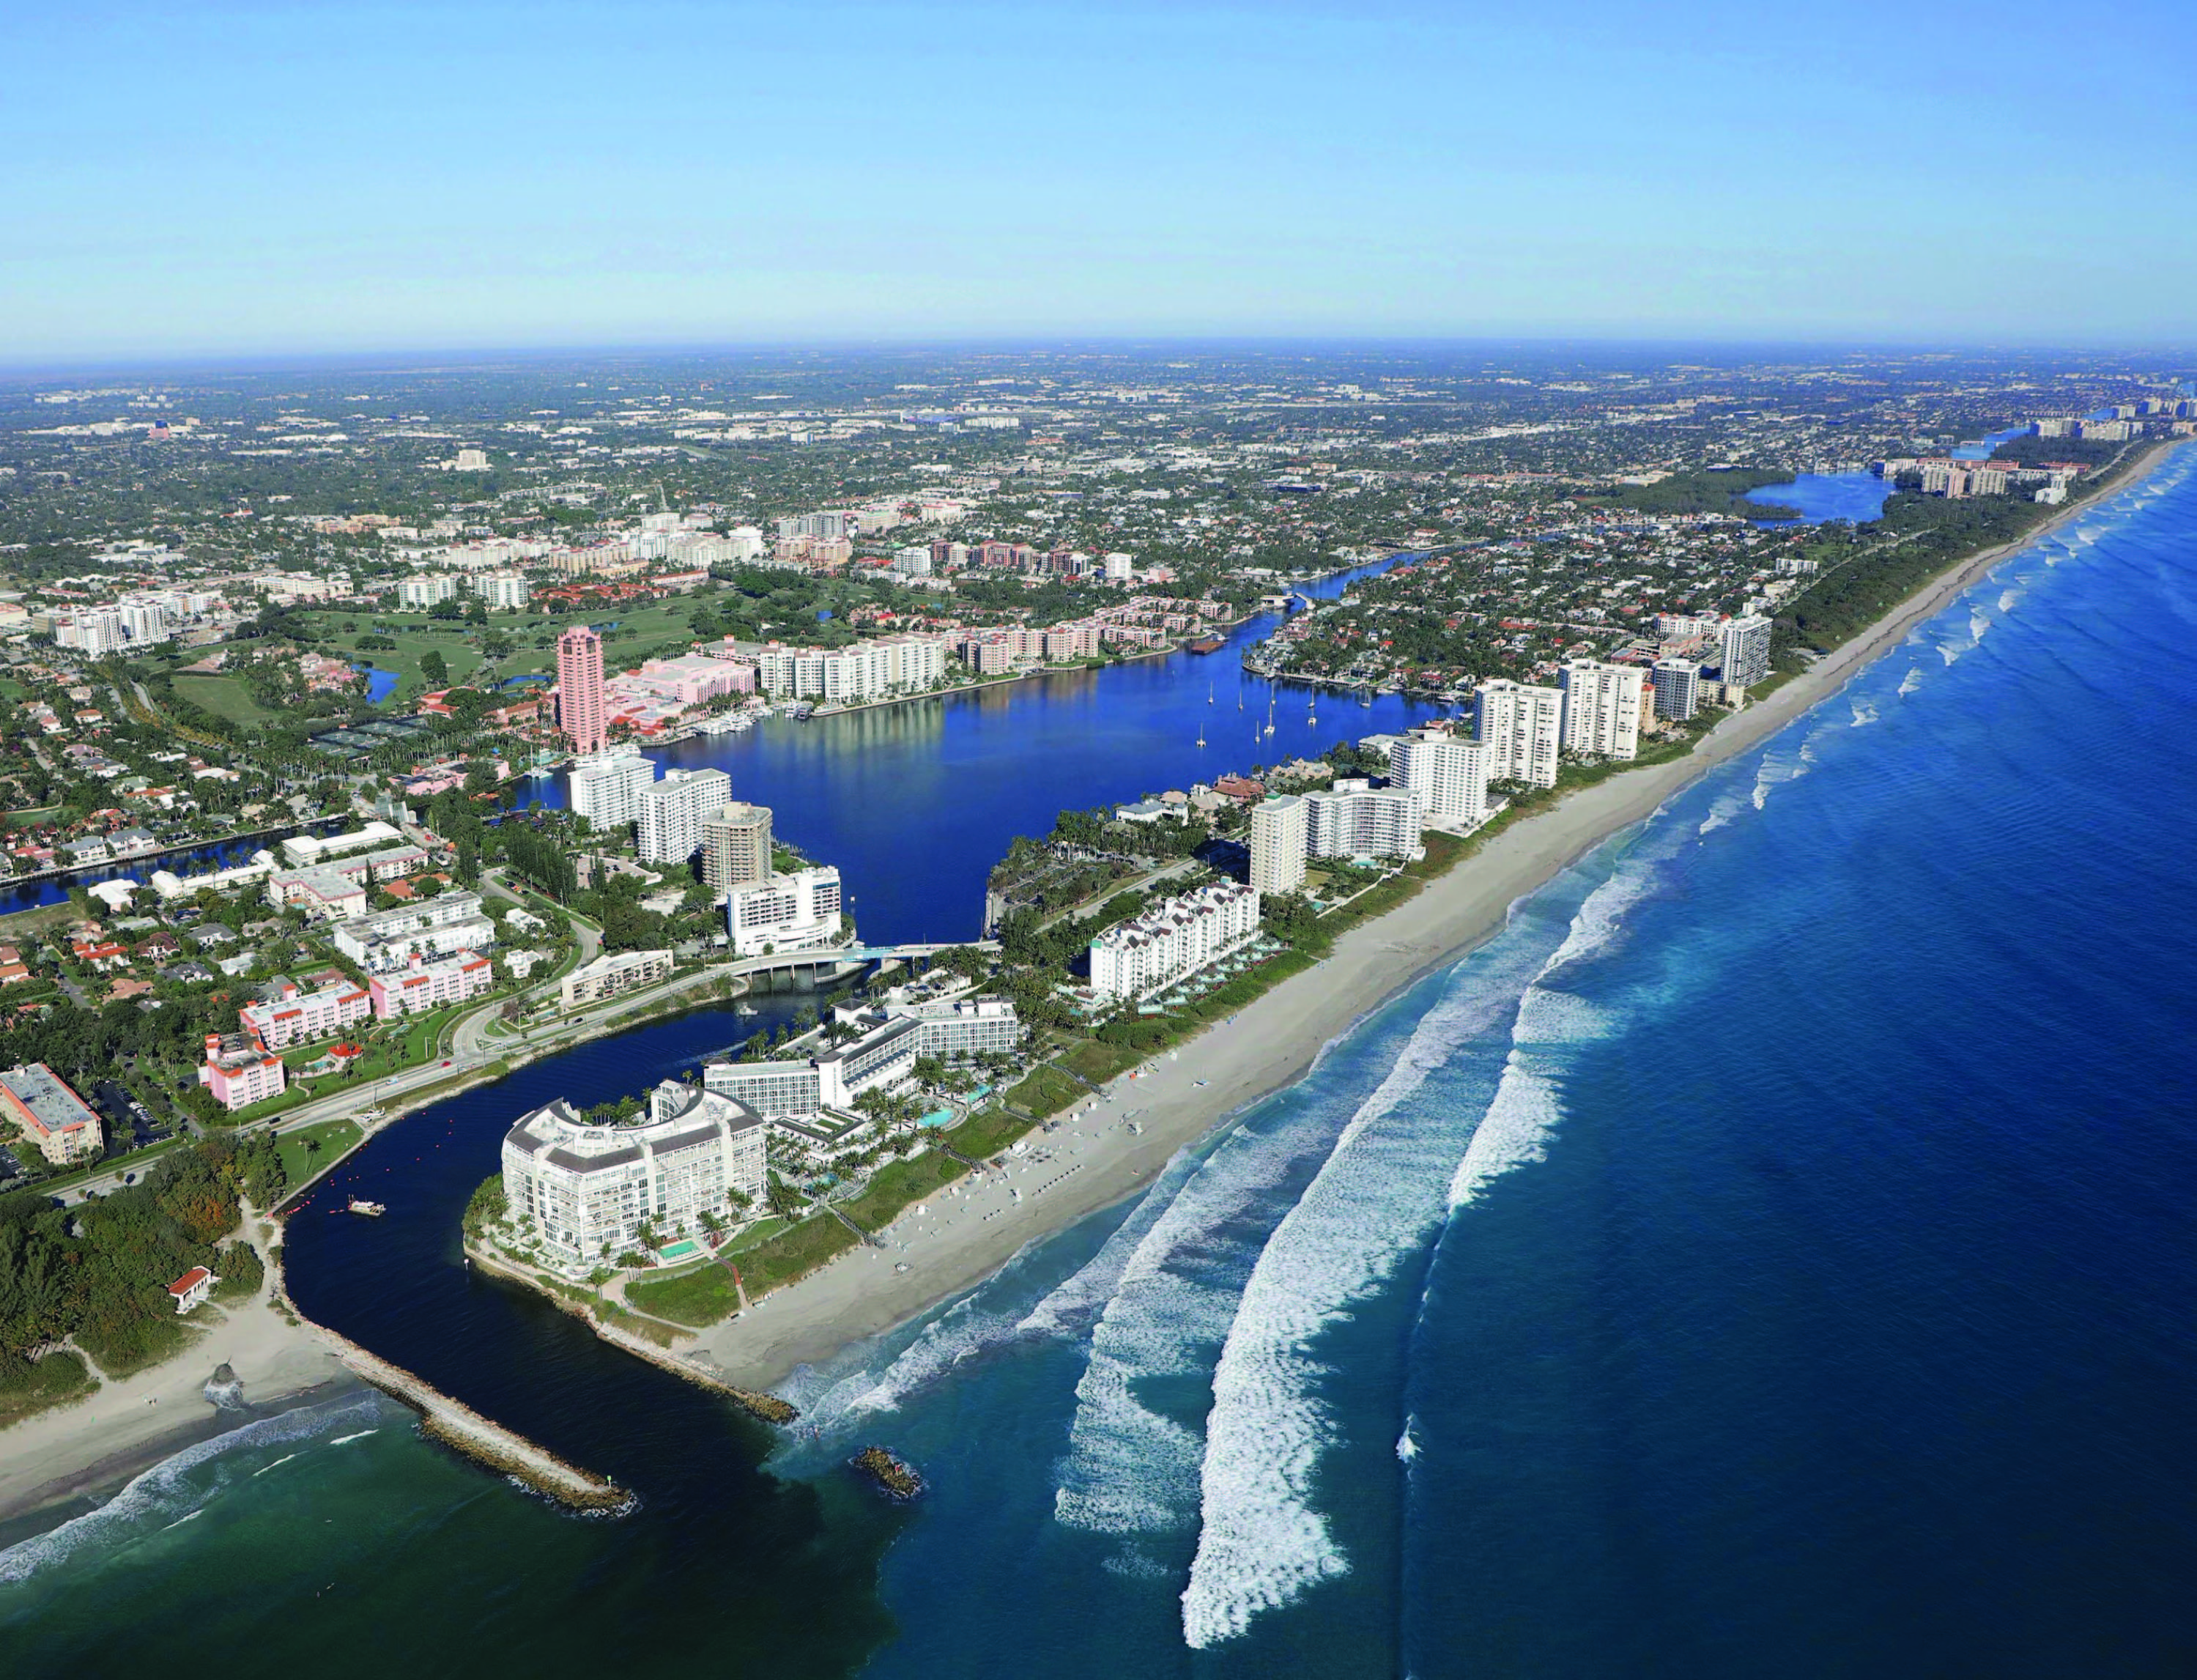 475 Royal Palm Unit 801, Boca Raton, Florida 33432